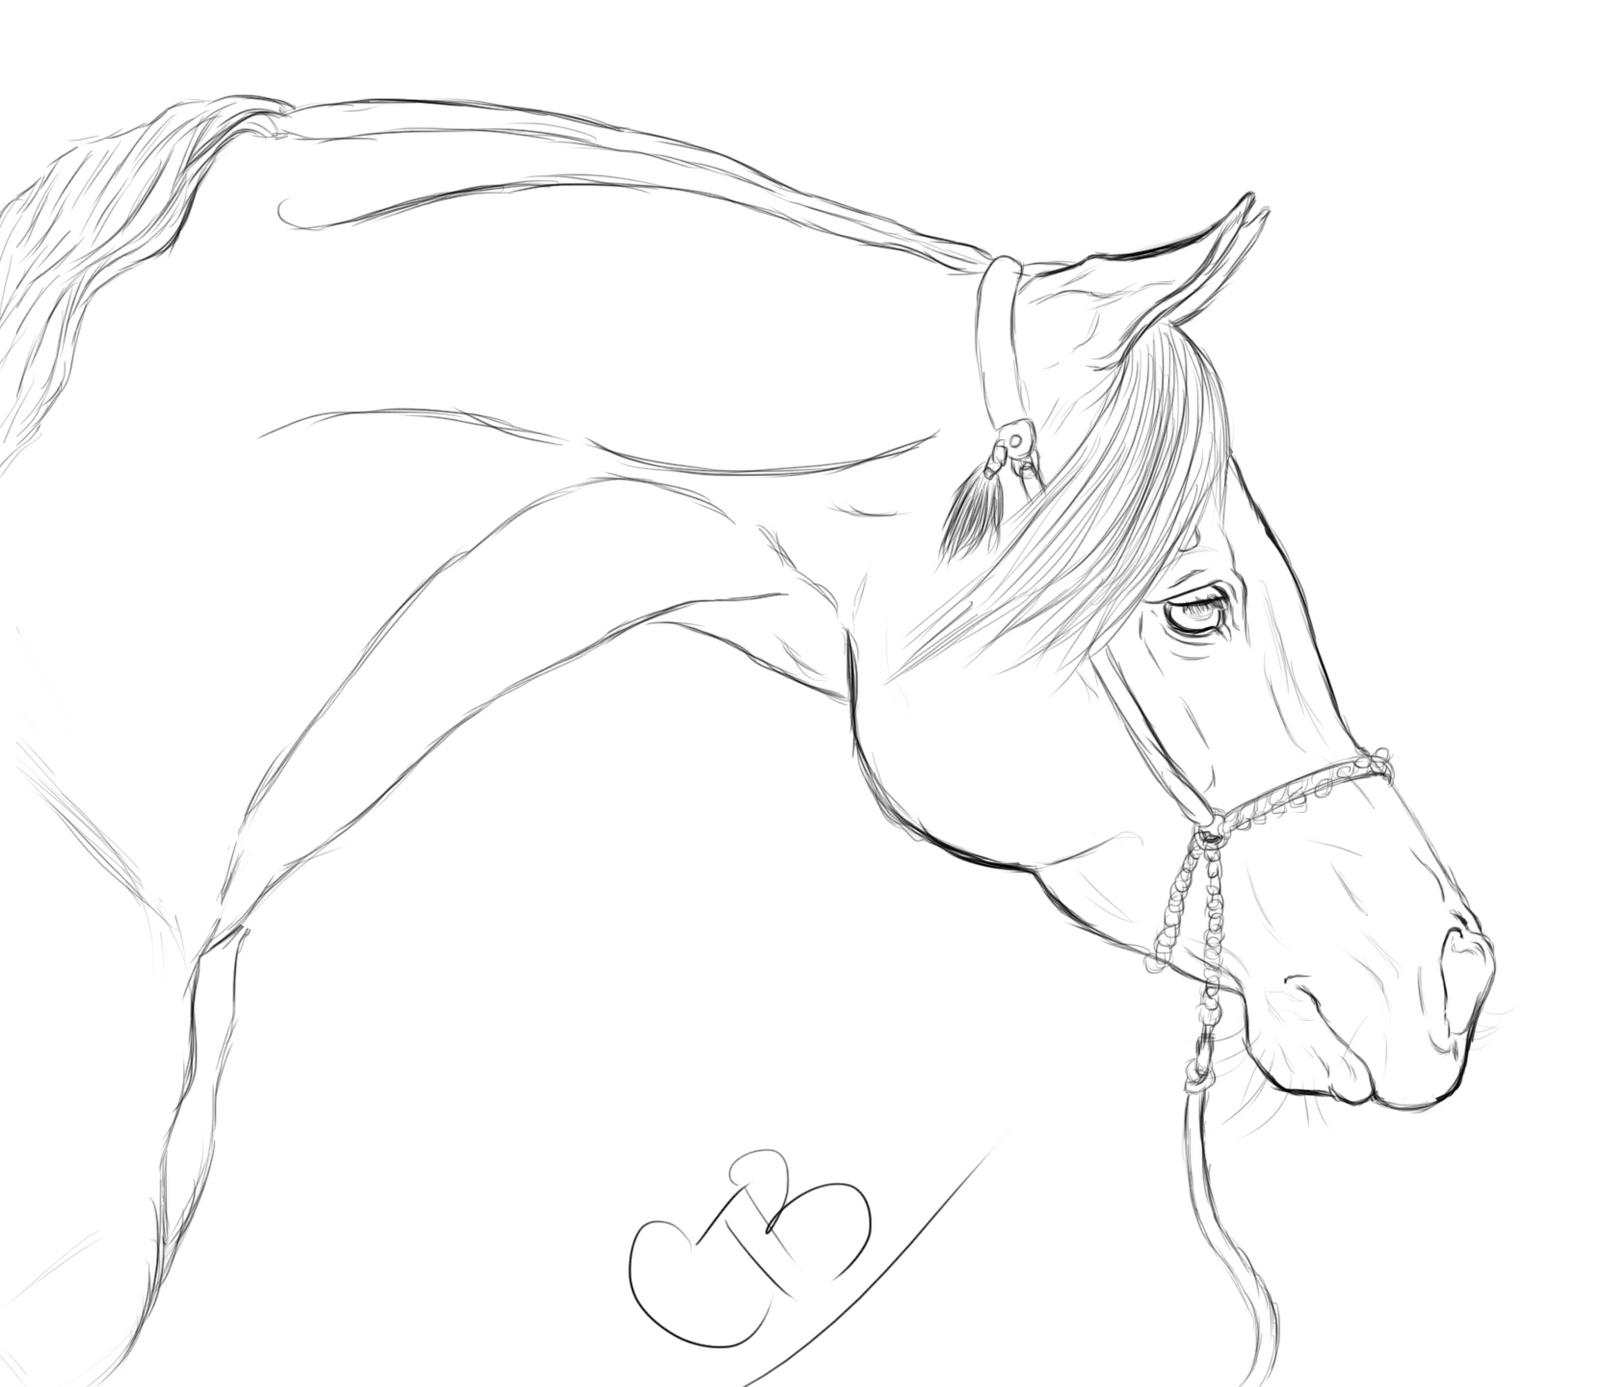 Sketch~ Arabian by ChellytheBean on DeviantArt